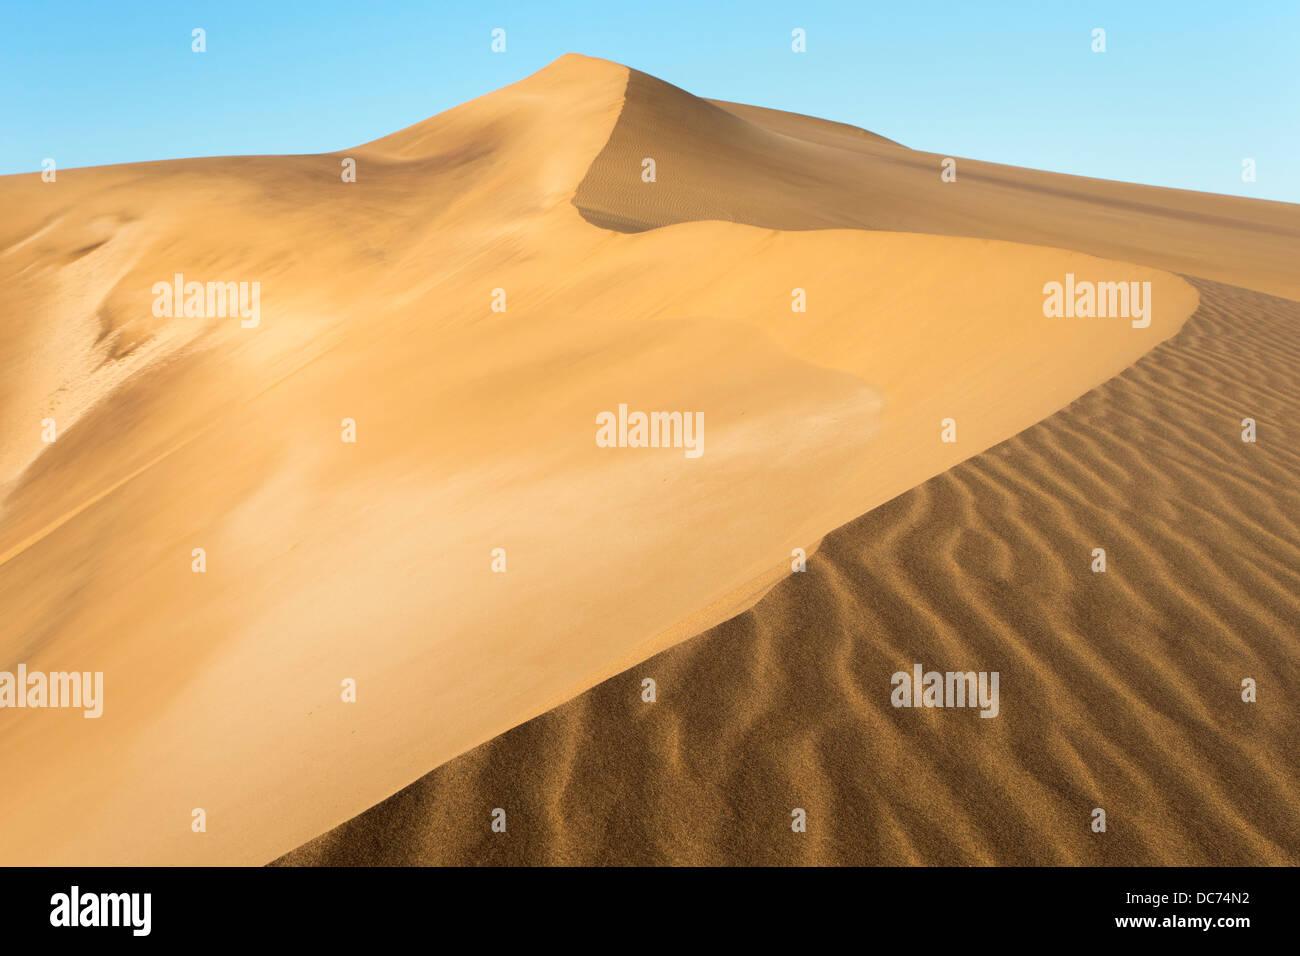 Sand dunes near Swakopmund, Dorob national park, Namibia, April 2013 - Stock Image